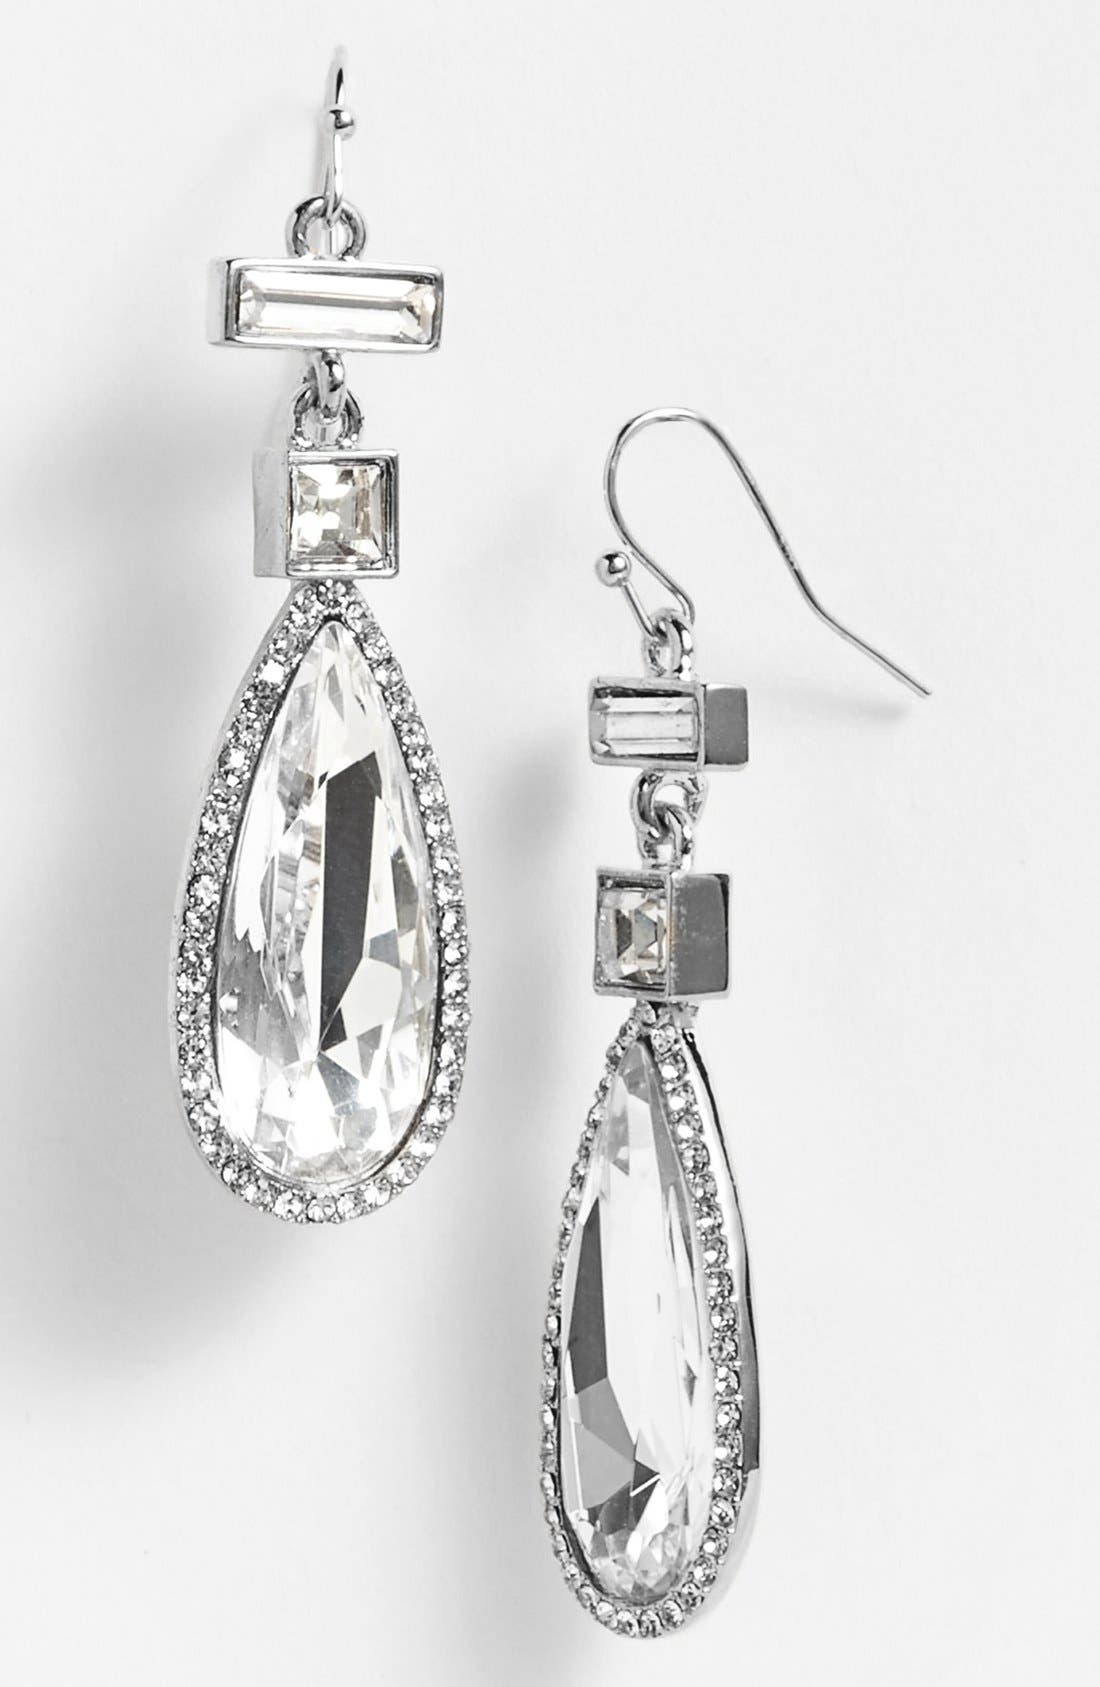 Alternate Image 1 Selected - Vince Camuto 'Diamonds in the Sky' Crystal Teardrop Earrings